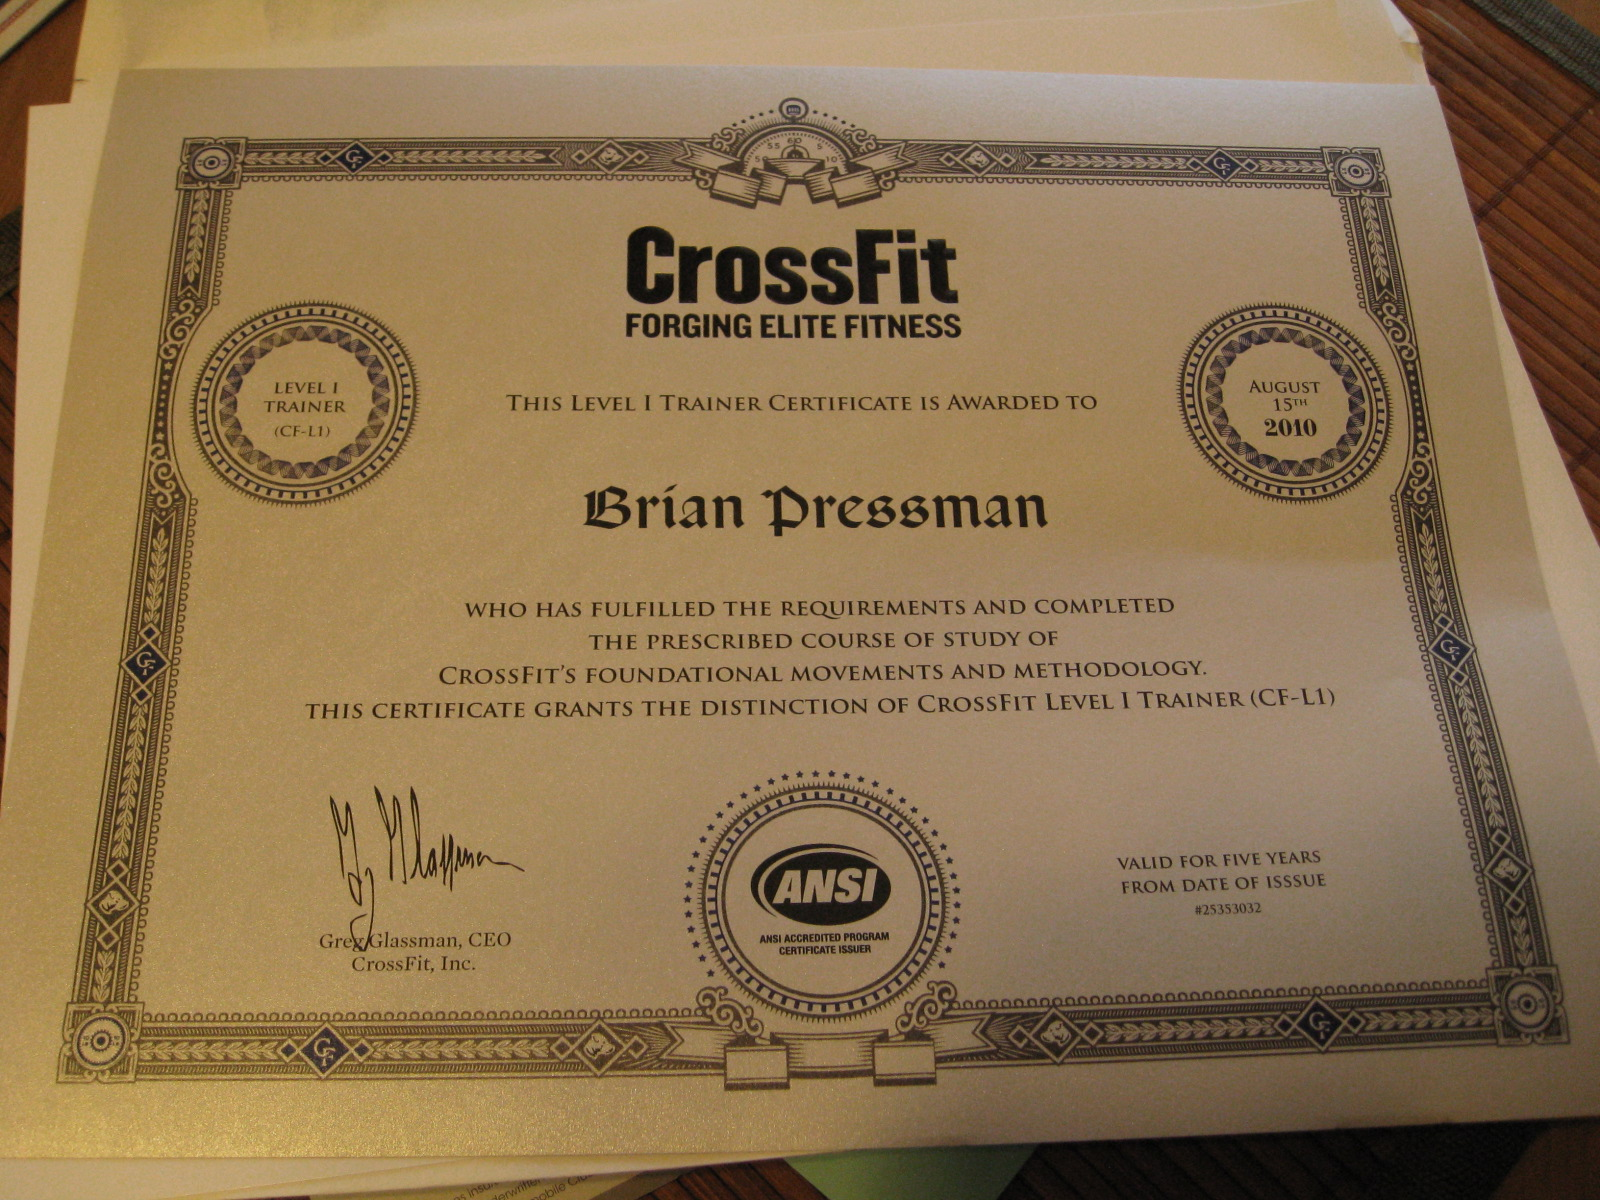 New crossfit certification pressmans hawaii blog share xflitez Images